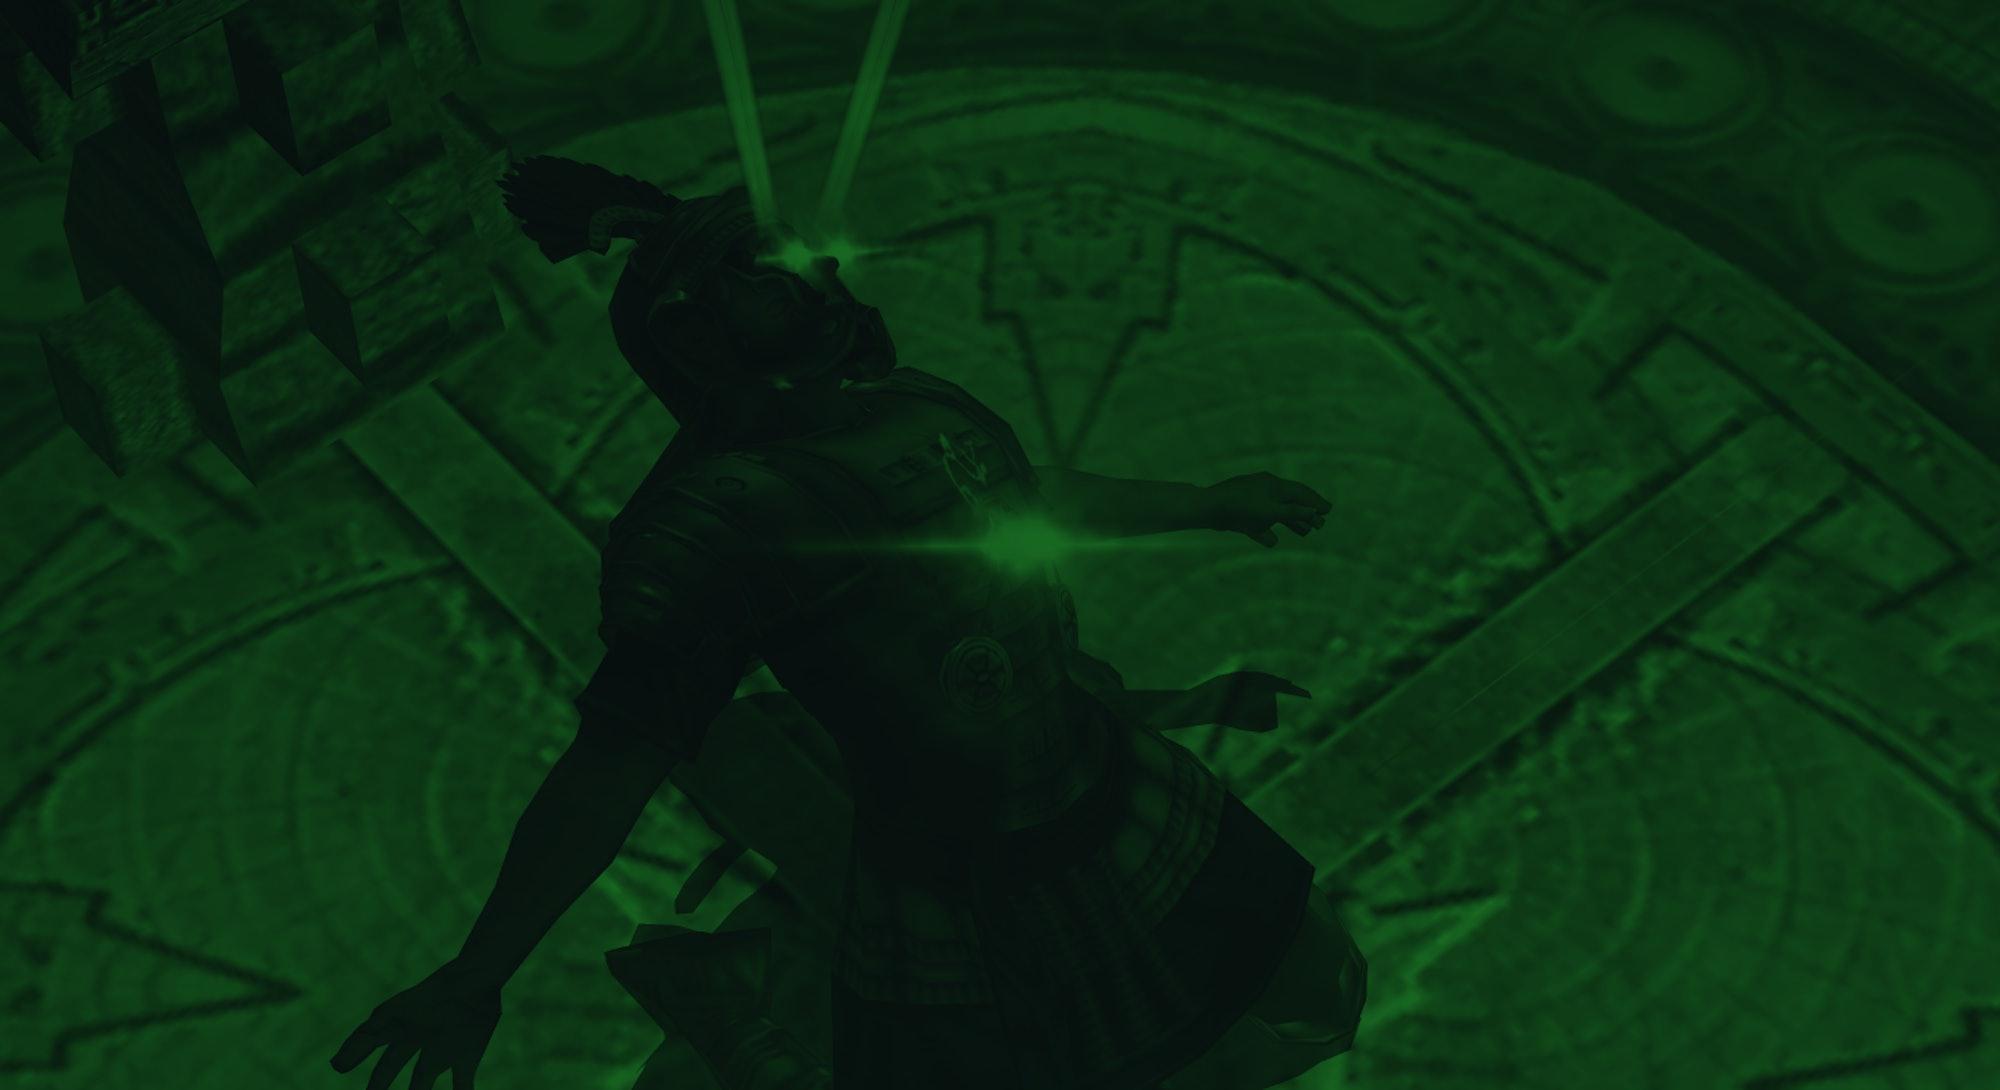 screenshot of skeleton from Eternal Darkness video game